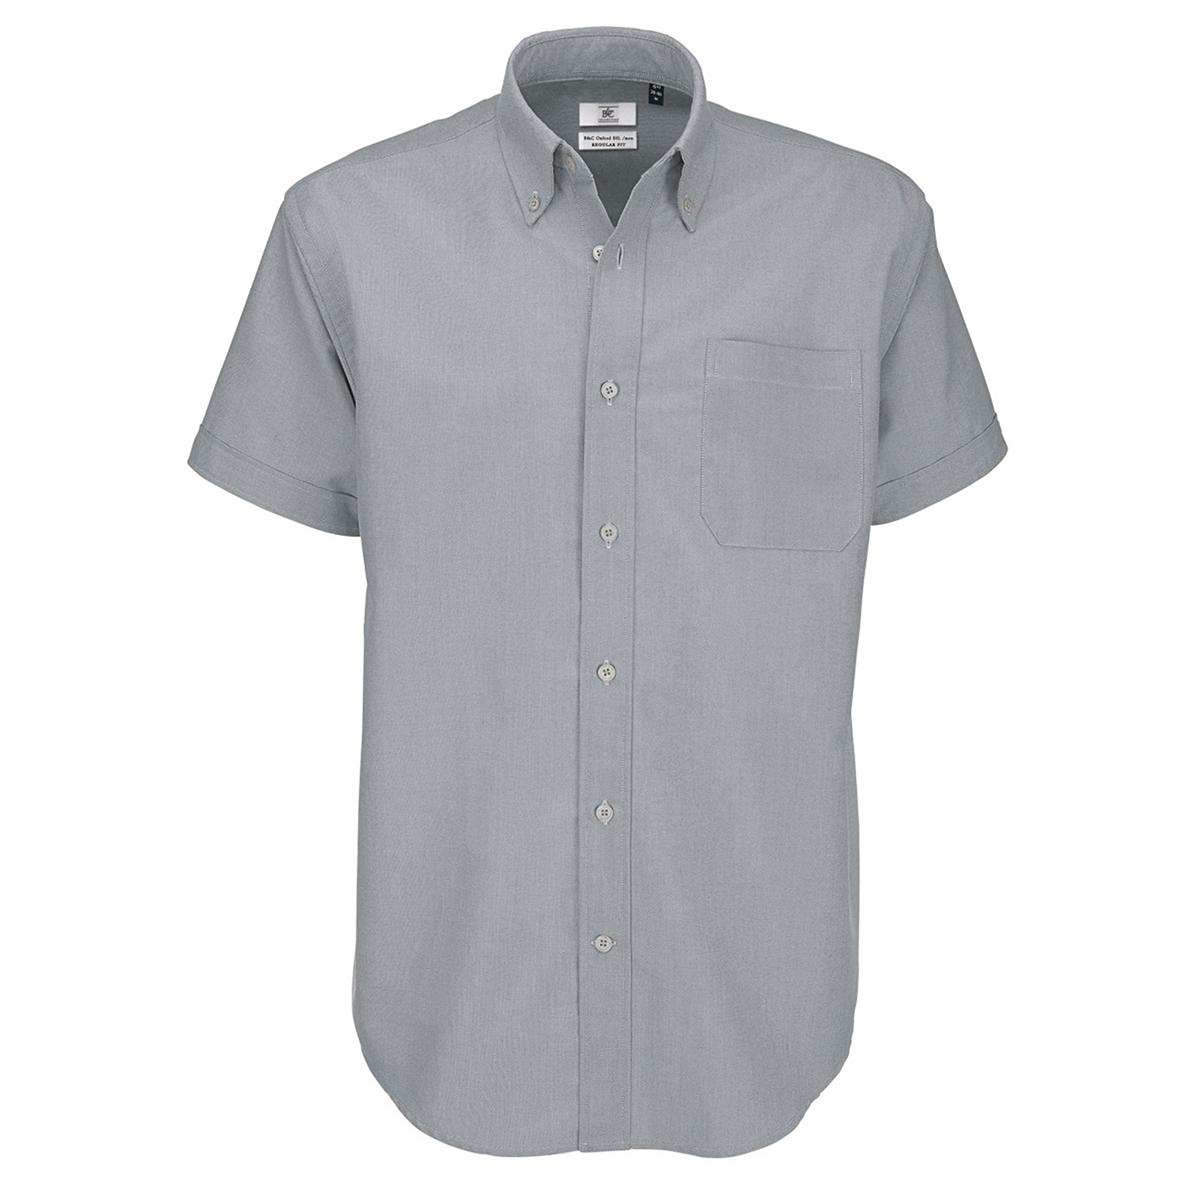 B&C Mens Oxford Short Sleeve Shirt / Mens Shirts (2XL) (Silver Moon)